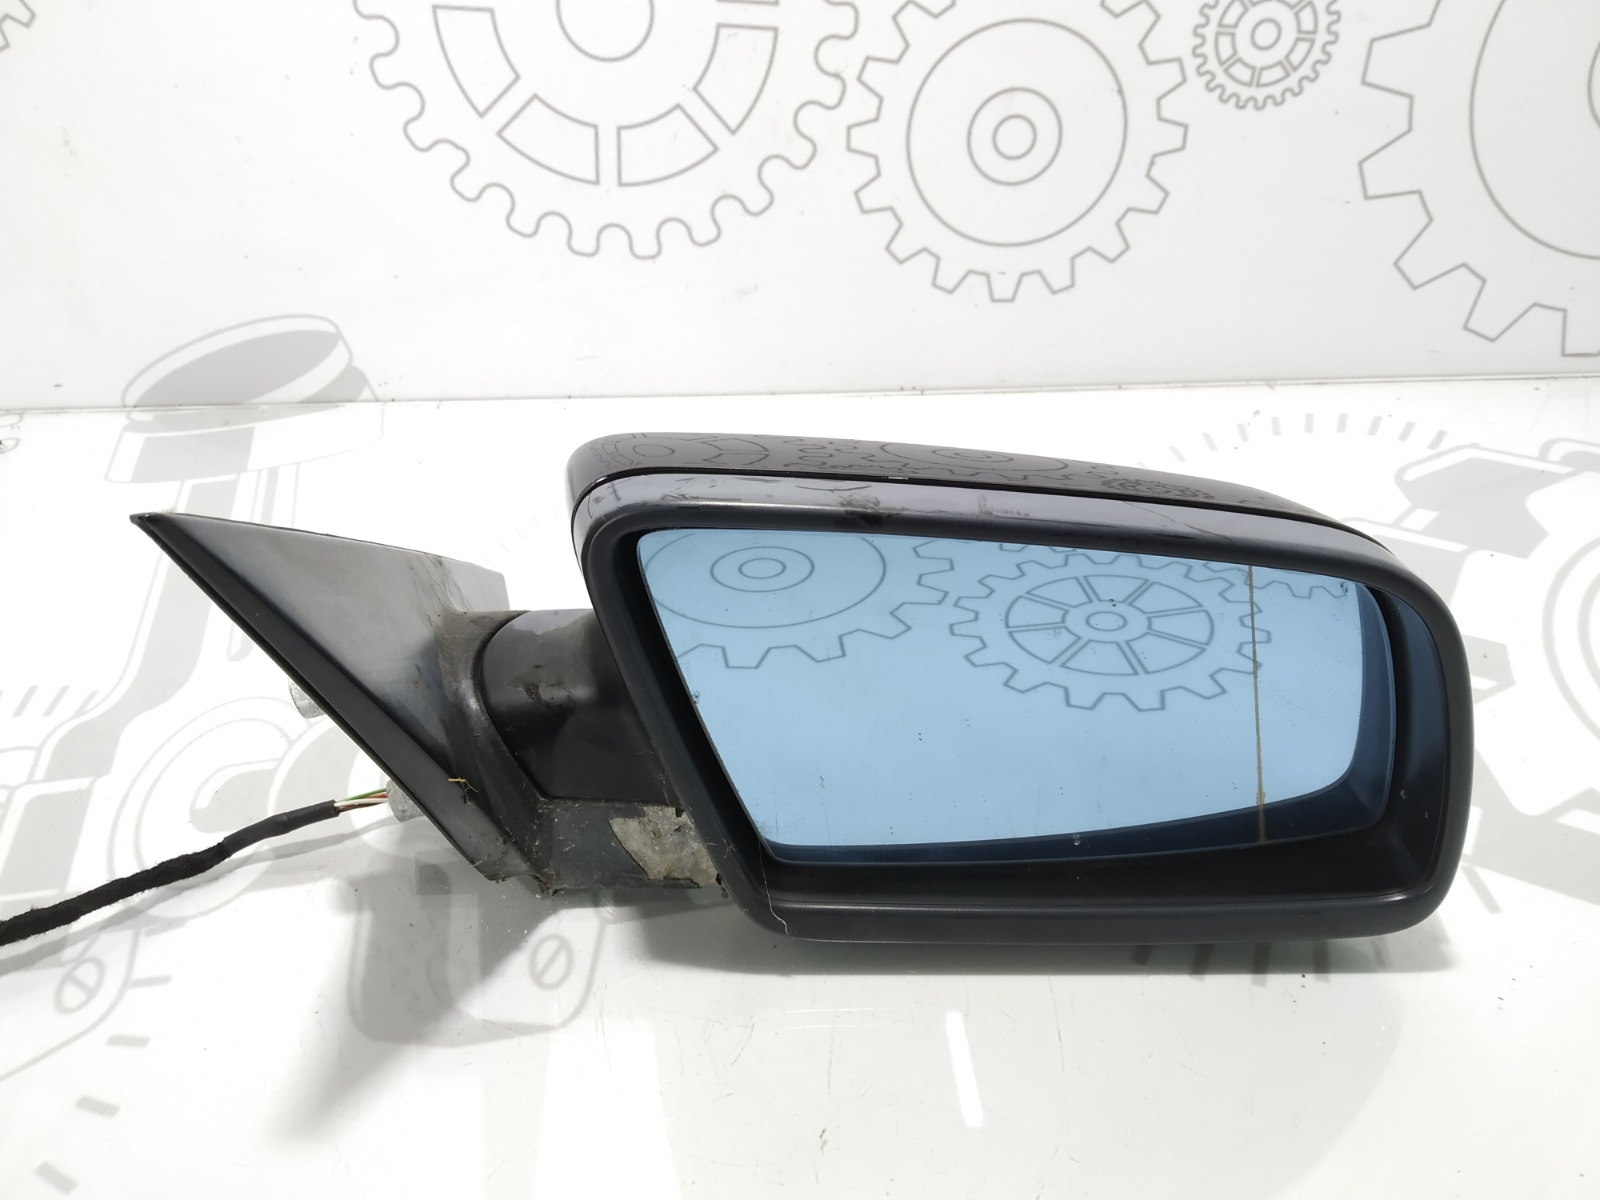 Зеркало наружное правое Bmw 5 E60 3.0 I 2004 (б/у)